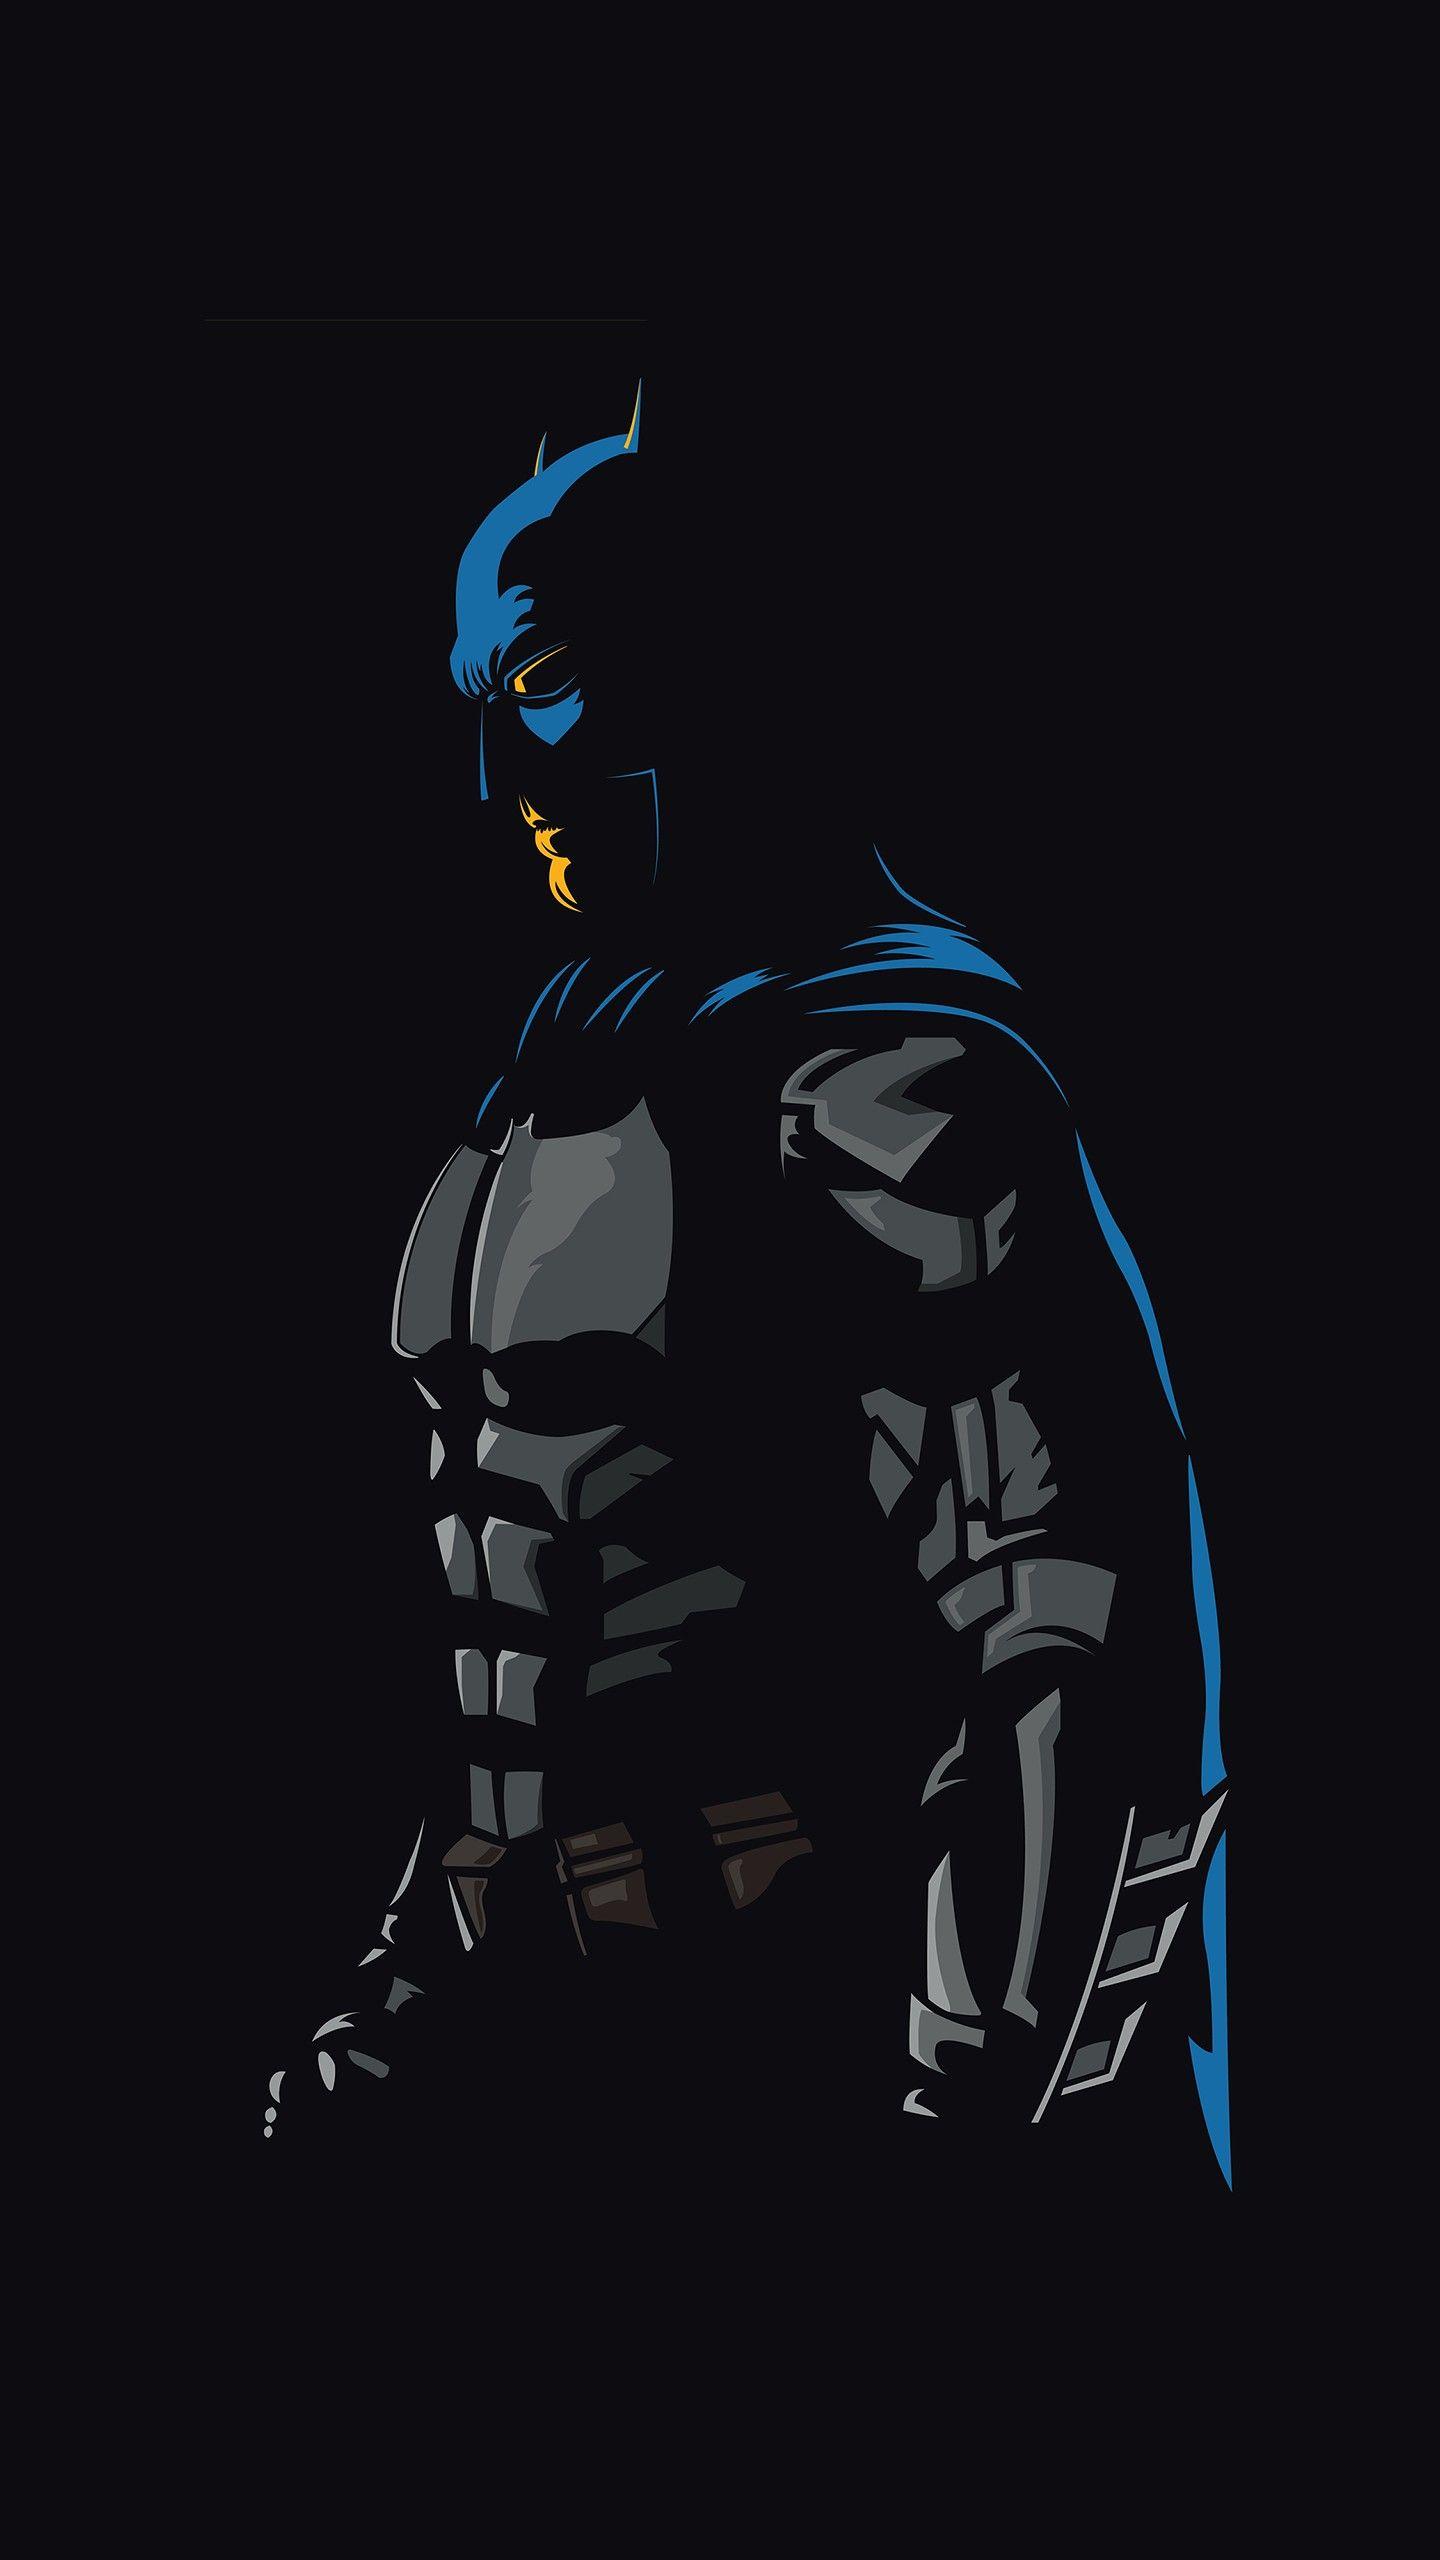 Batman 4k iPhone Wallpapers - Wallpaper Cave